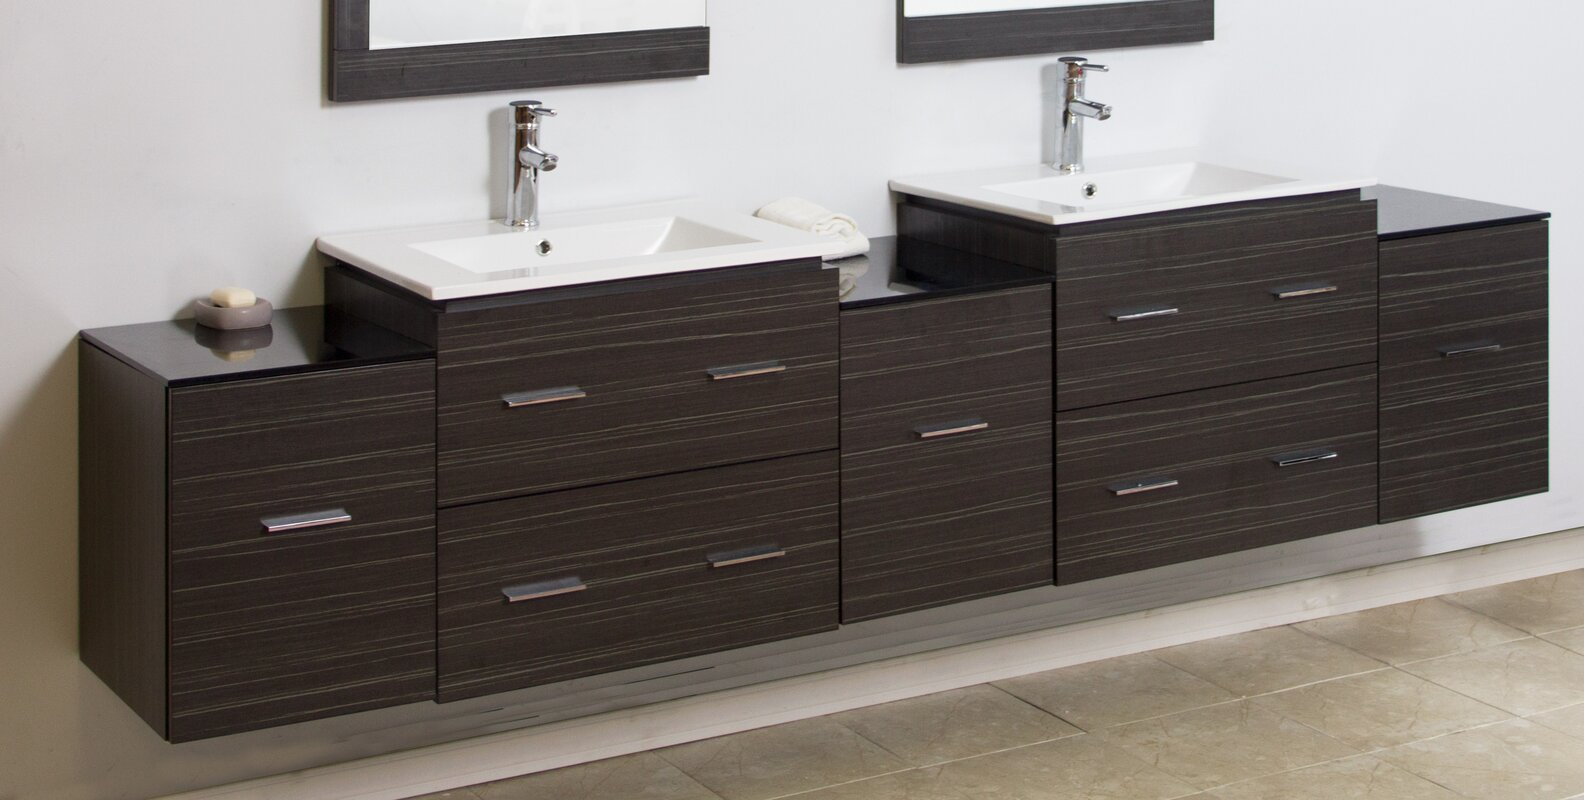 90  Double Modern Wall Mount Bathroom Vanity Set. American Imaginations 90  Double Modern Wall Mount Bathroom Vanity